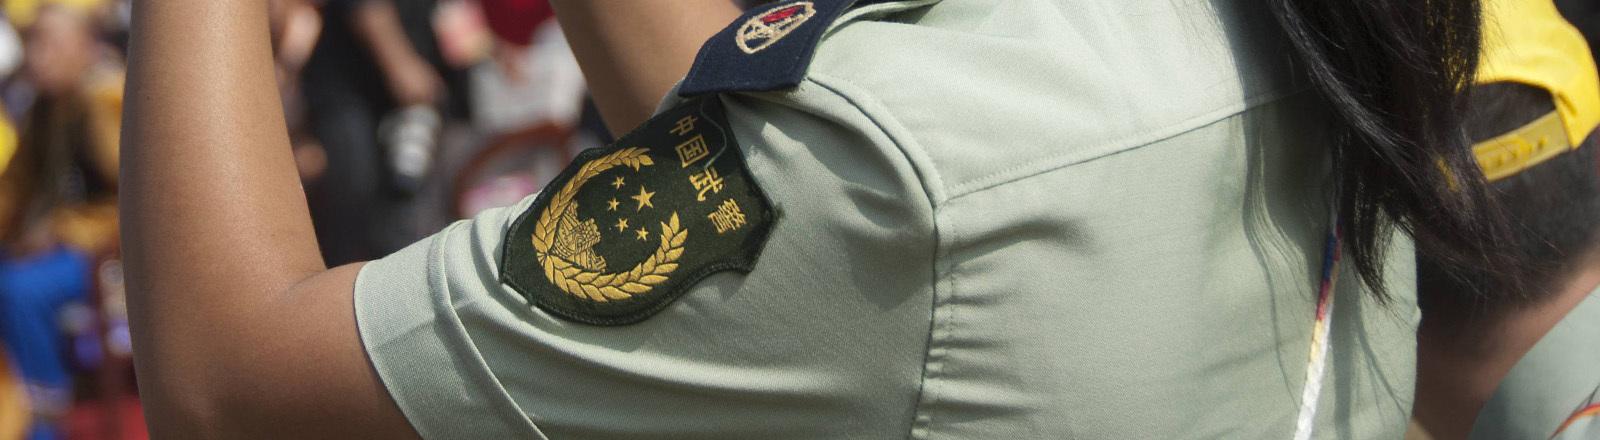 Polizei in China